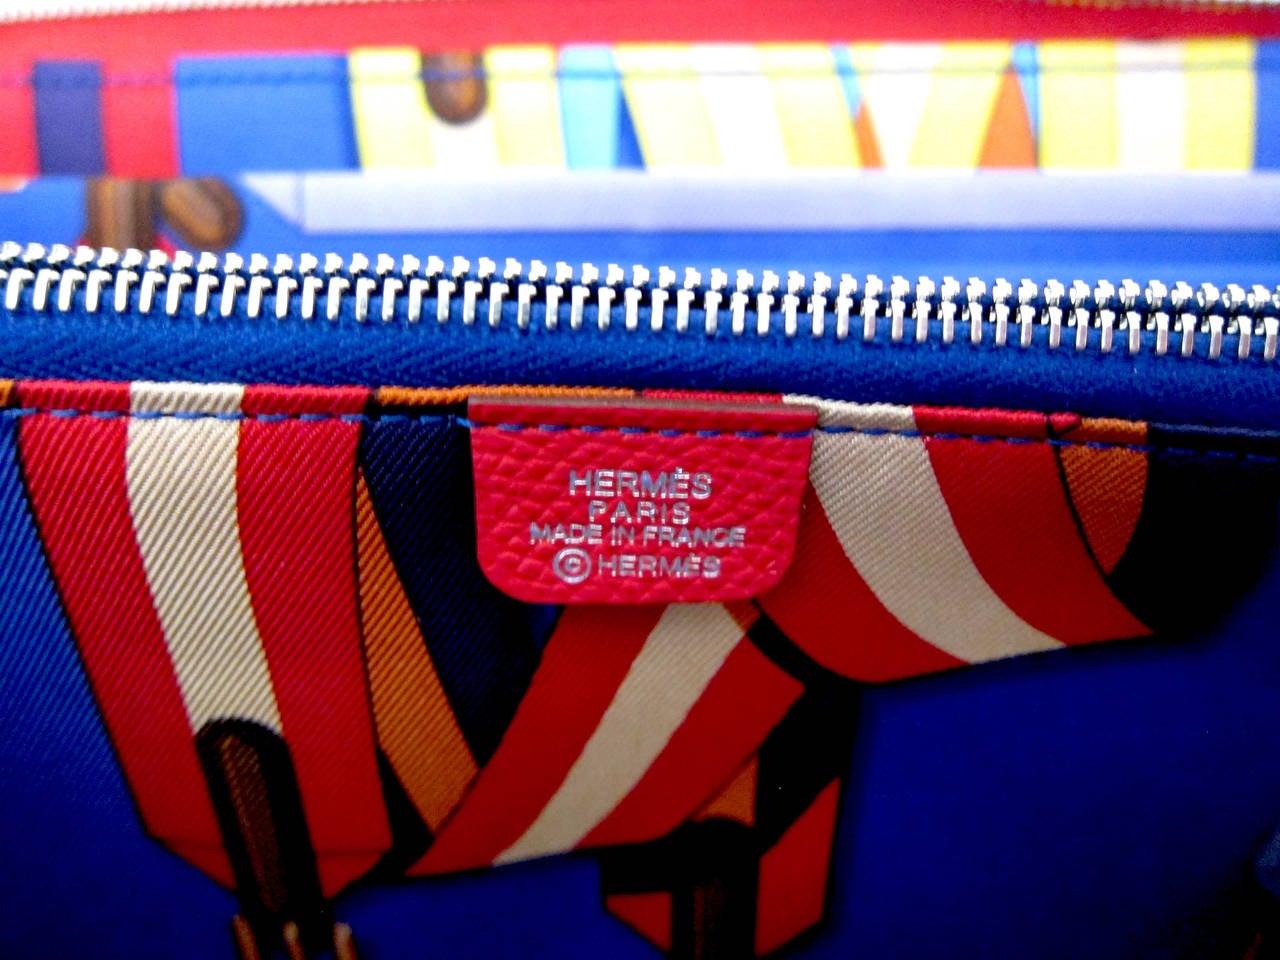 hermes Silk'in bougainvillea red/electric blue